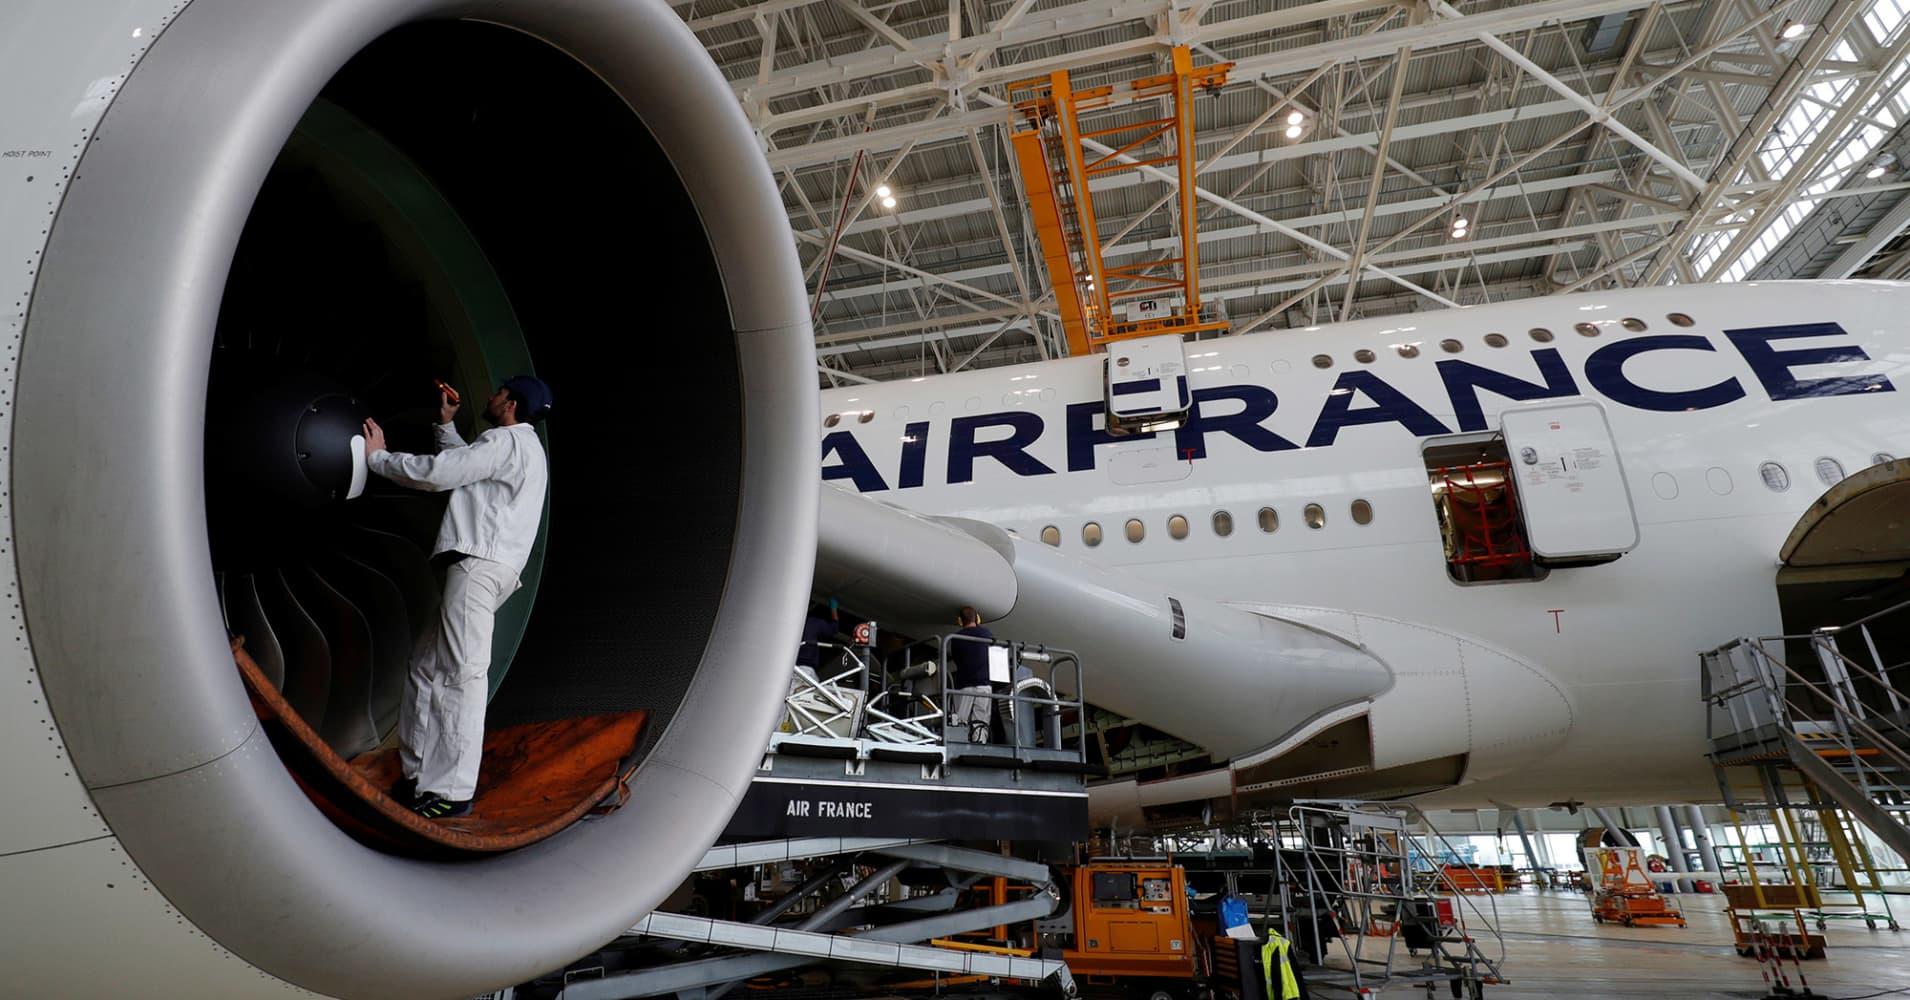 Airbus to take majority stake in Bombardier C-Series jet program